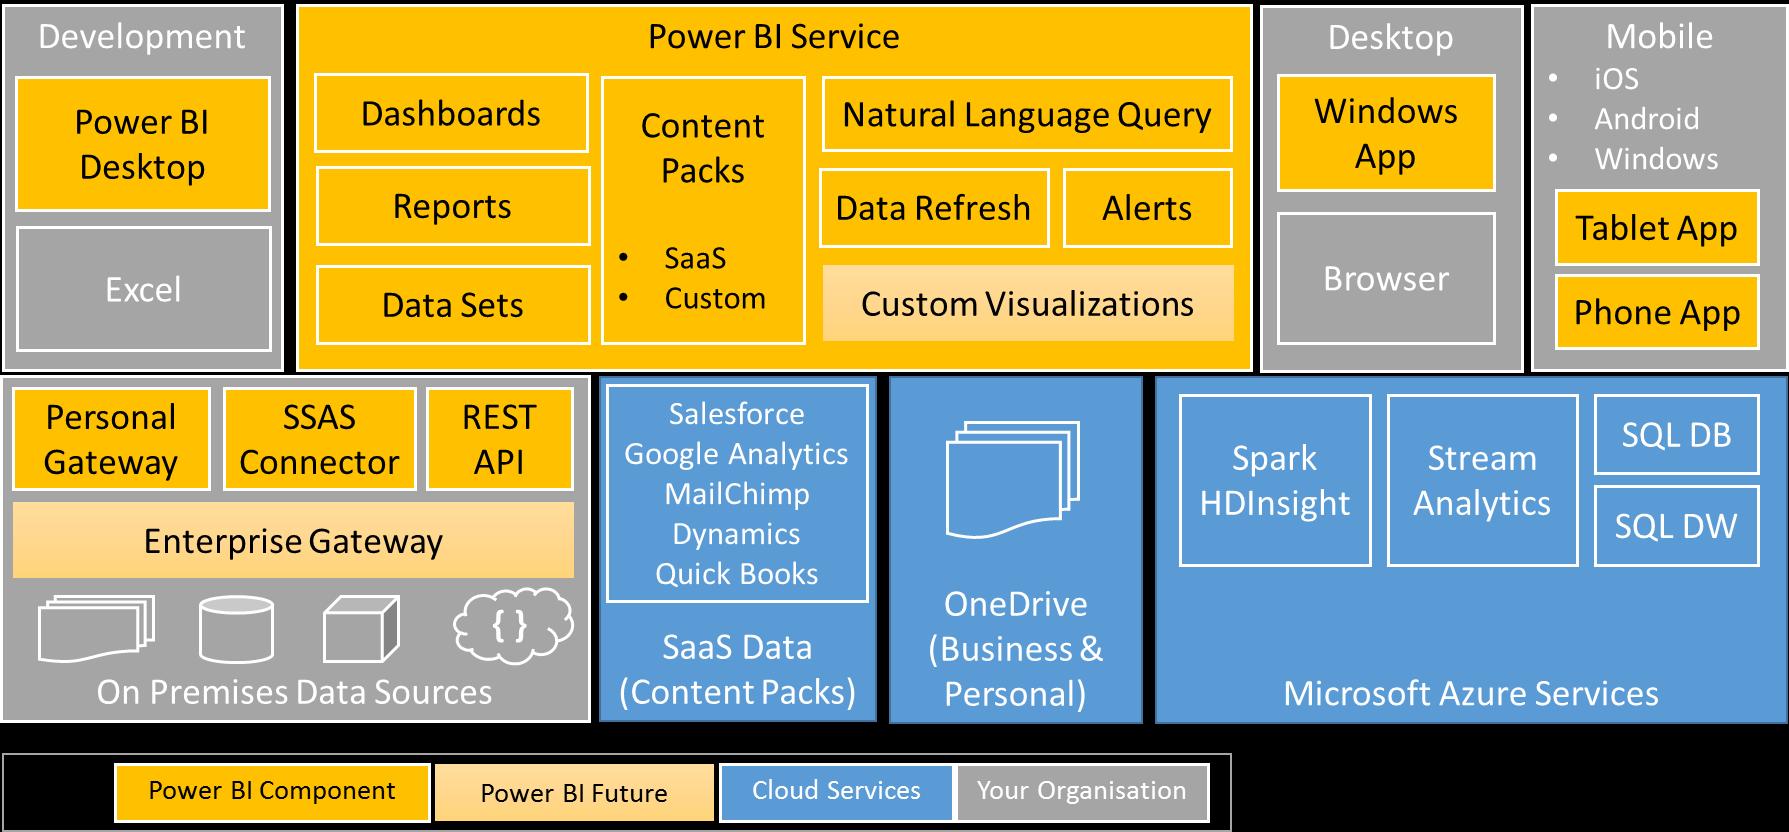 how to prepare data for power bi